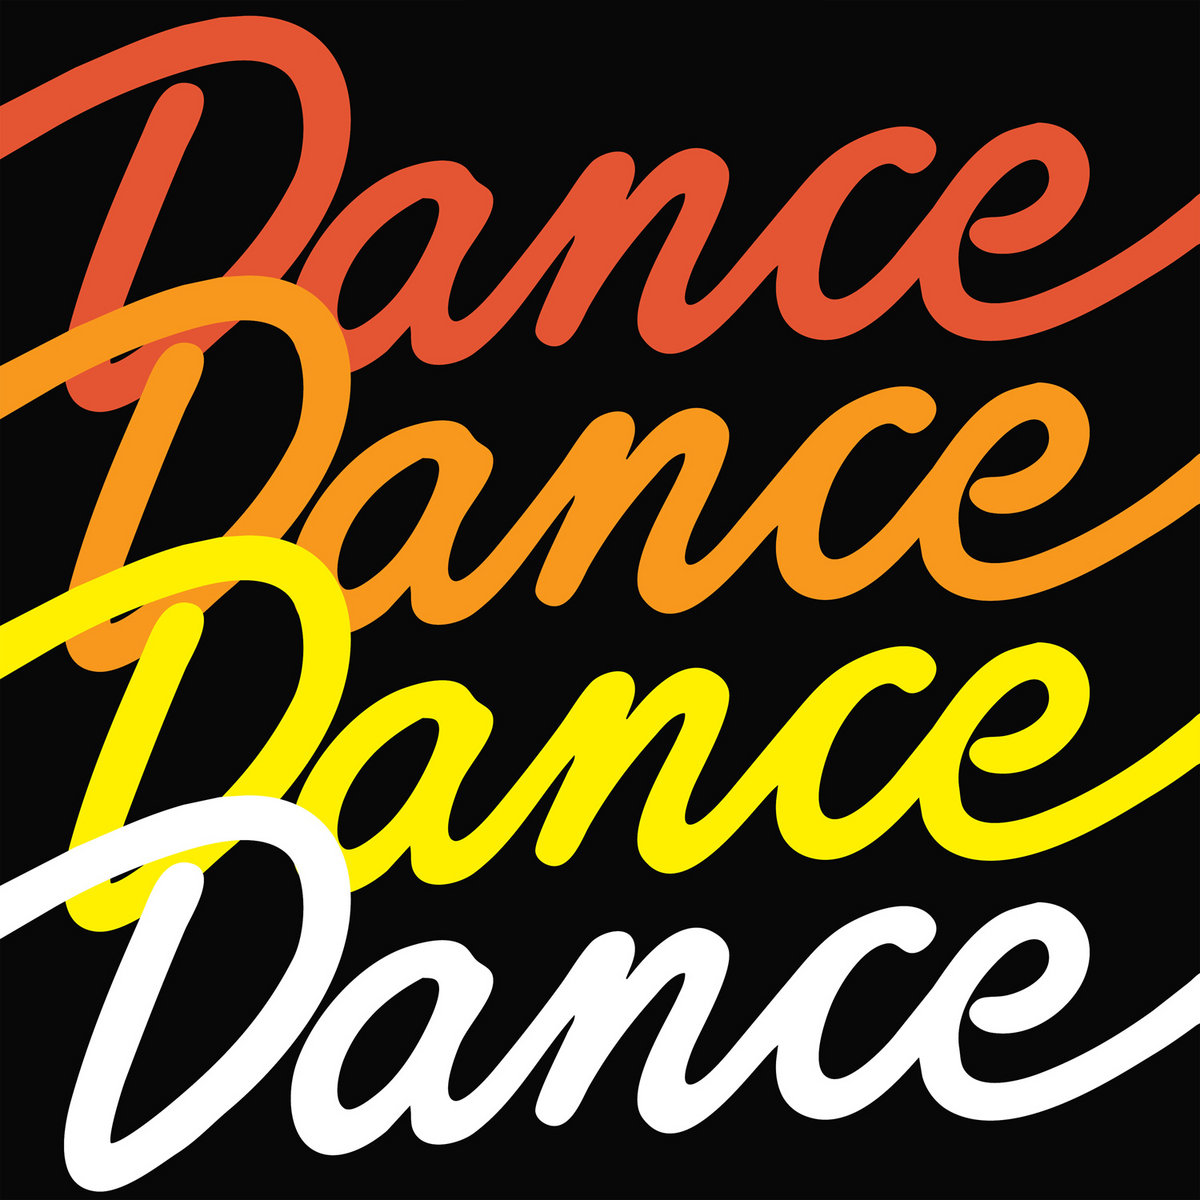 Watch the Dance (M+M 80s Classic Mix) | Tuxedo